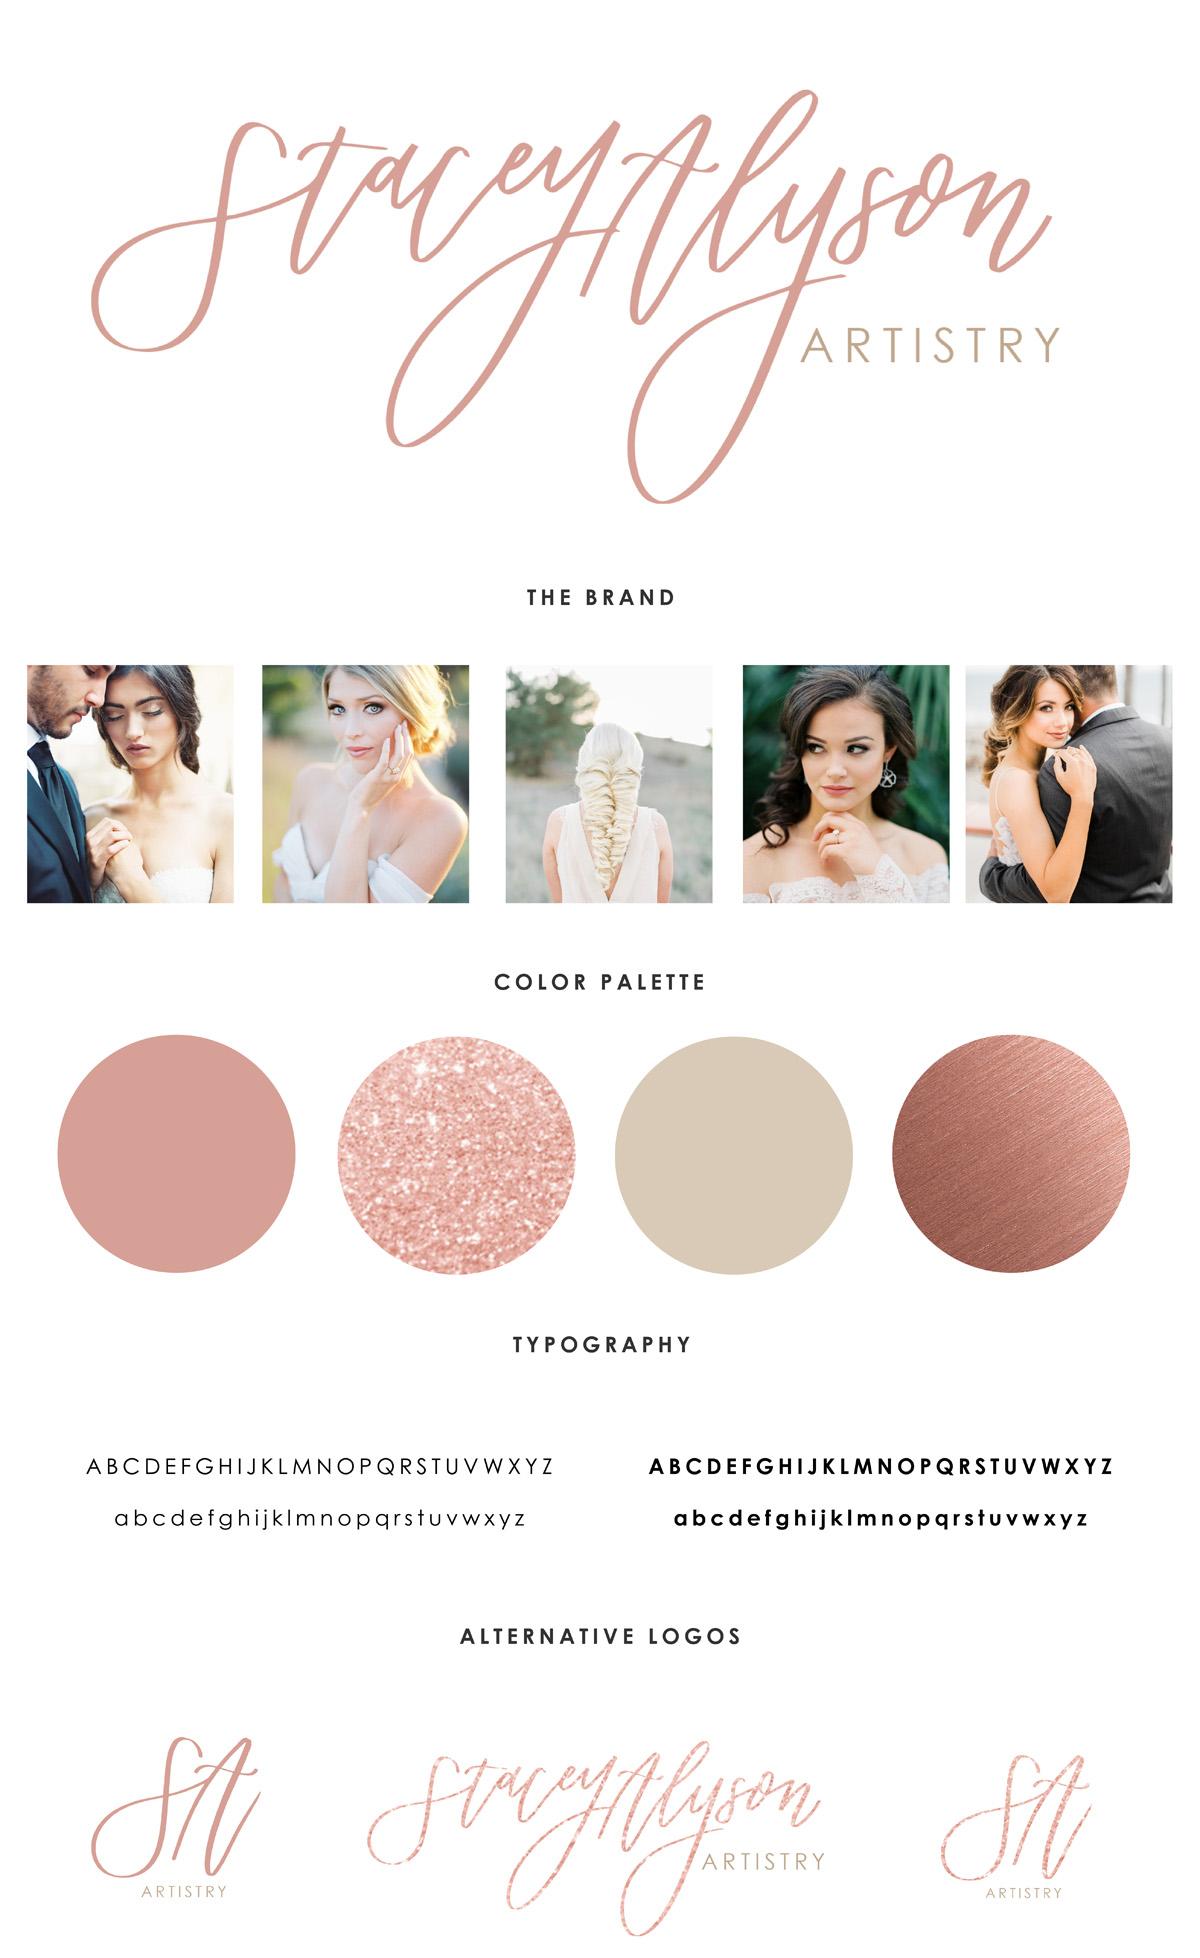 Stacey Alyson Branding Board.jpg